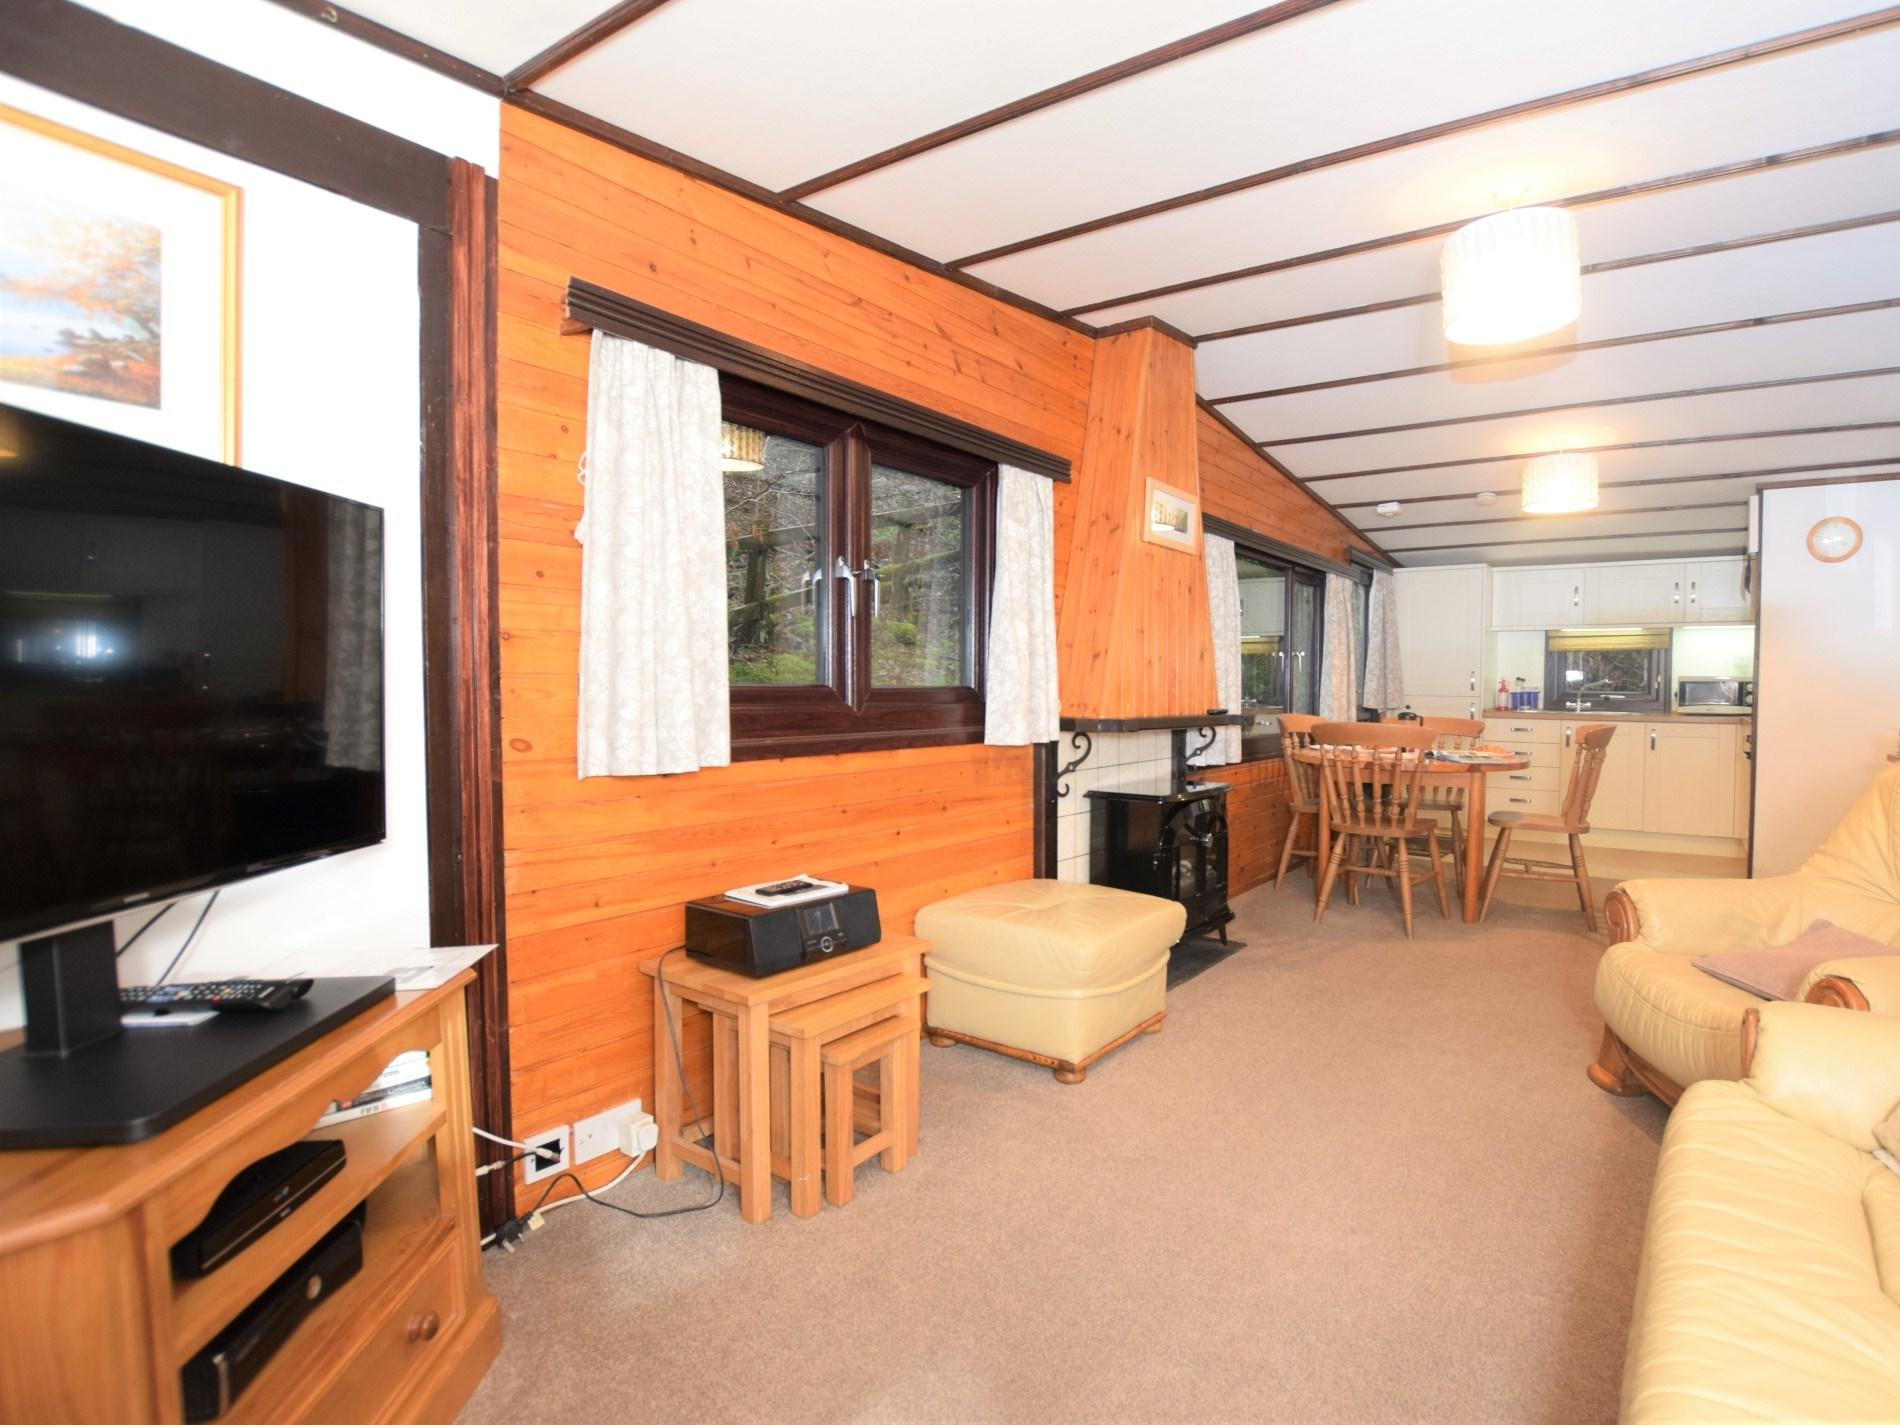 2 Bedroom Cottage in Ambleside, Scottish Borders